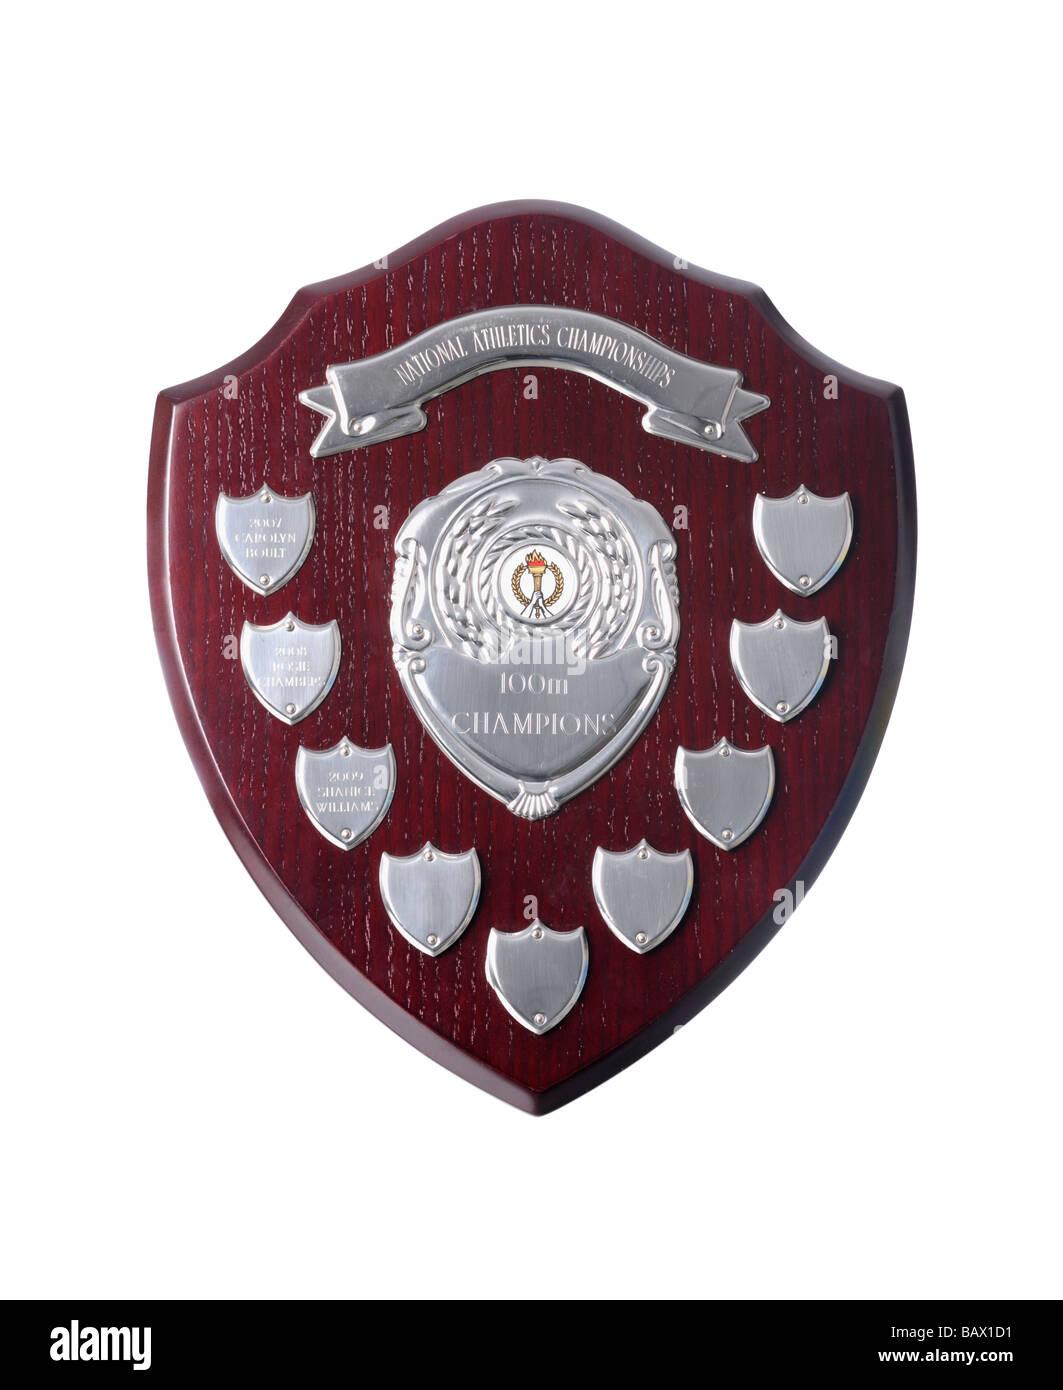 Wooden award shield - Stock Image